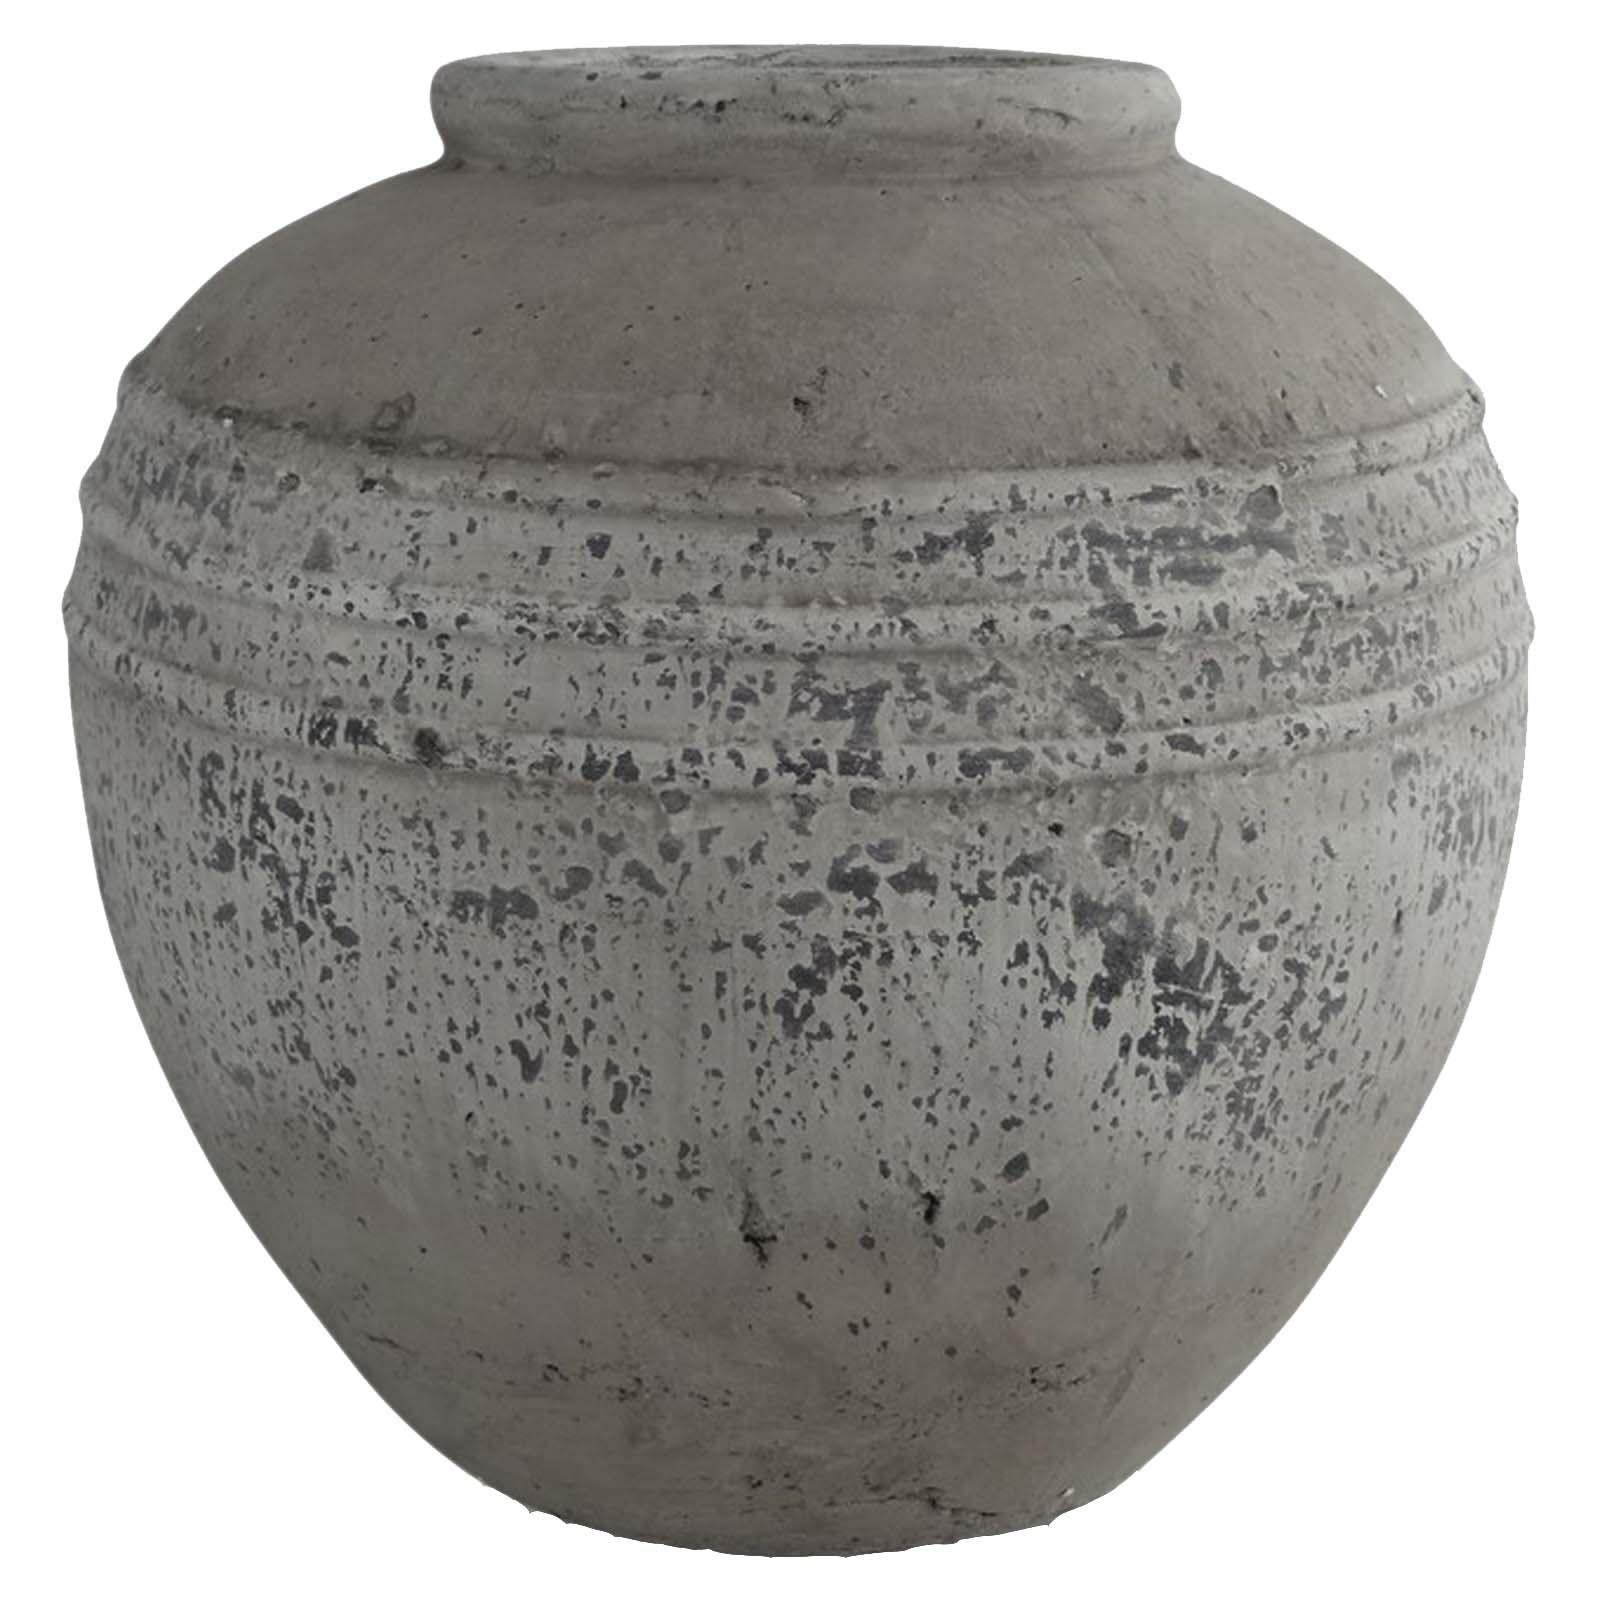 Ludlow Stone Rounded Pot 1 copy